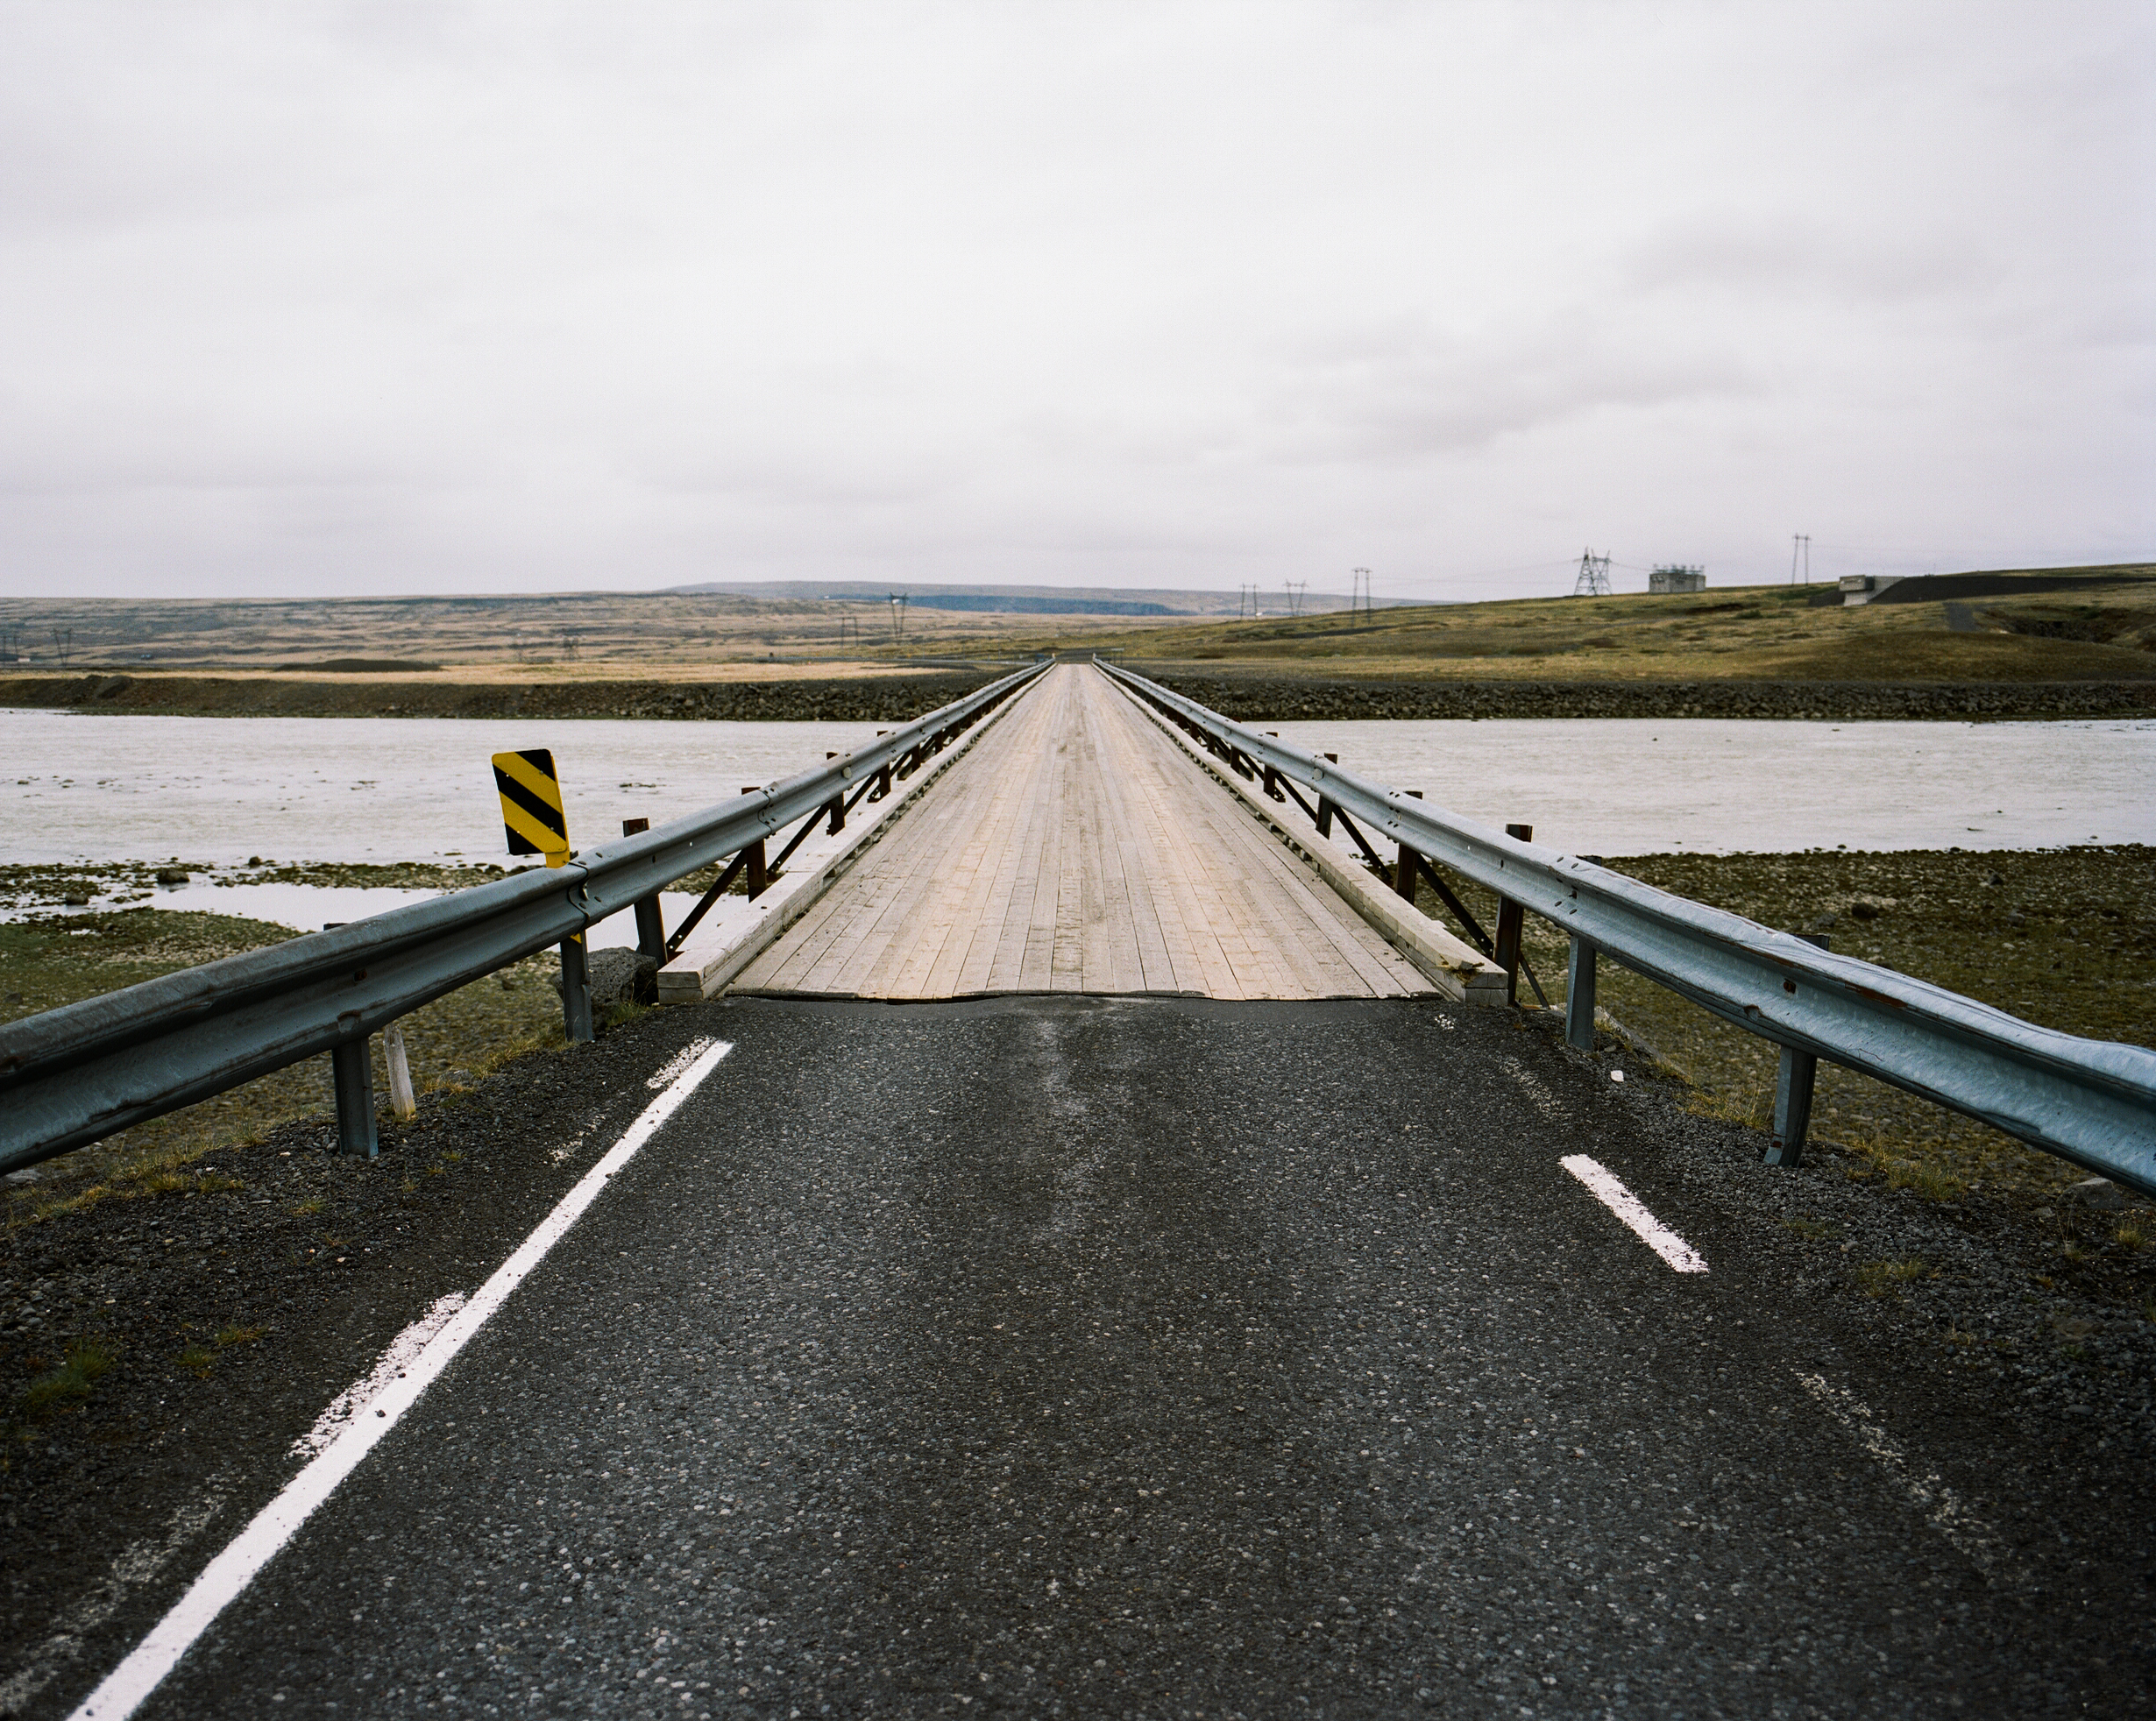 F&S_ICELAND_UNRETOUCHED_DANIELALEXANDERHARRIS_000029270001.jpg